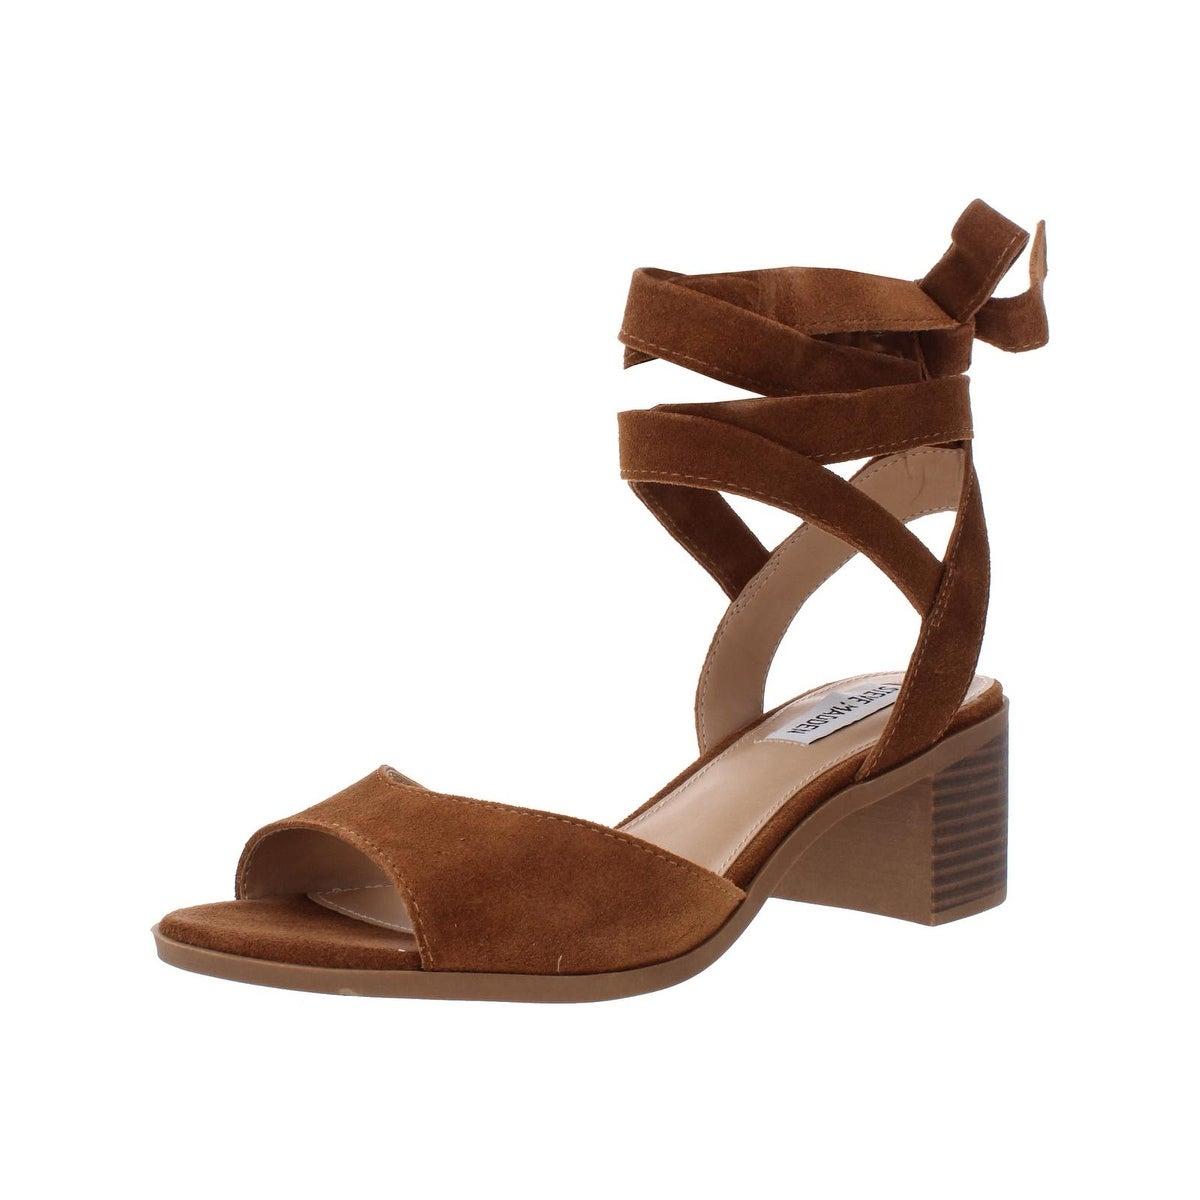 63451ff588 Buy Blue Women's Sandals Online at Overstock | Our Best Women's Shoes Deals